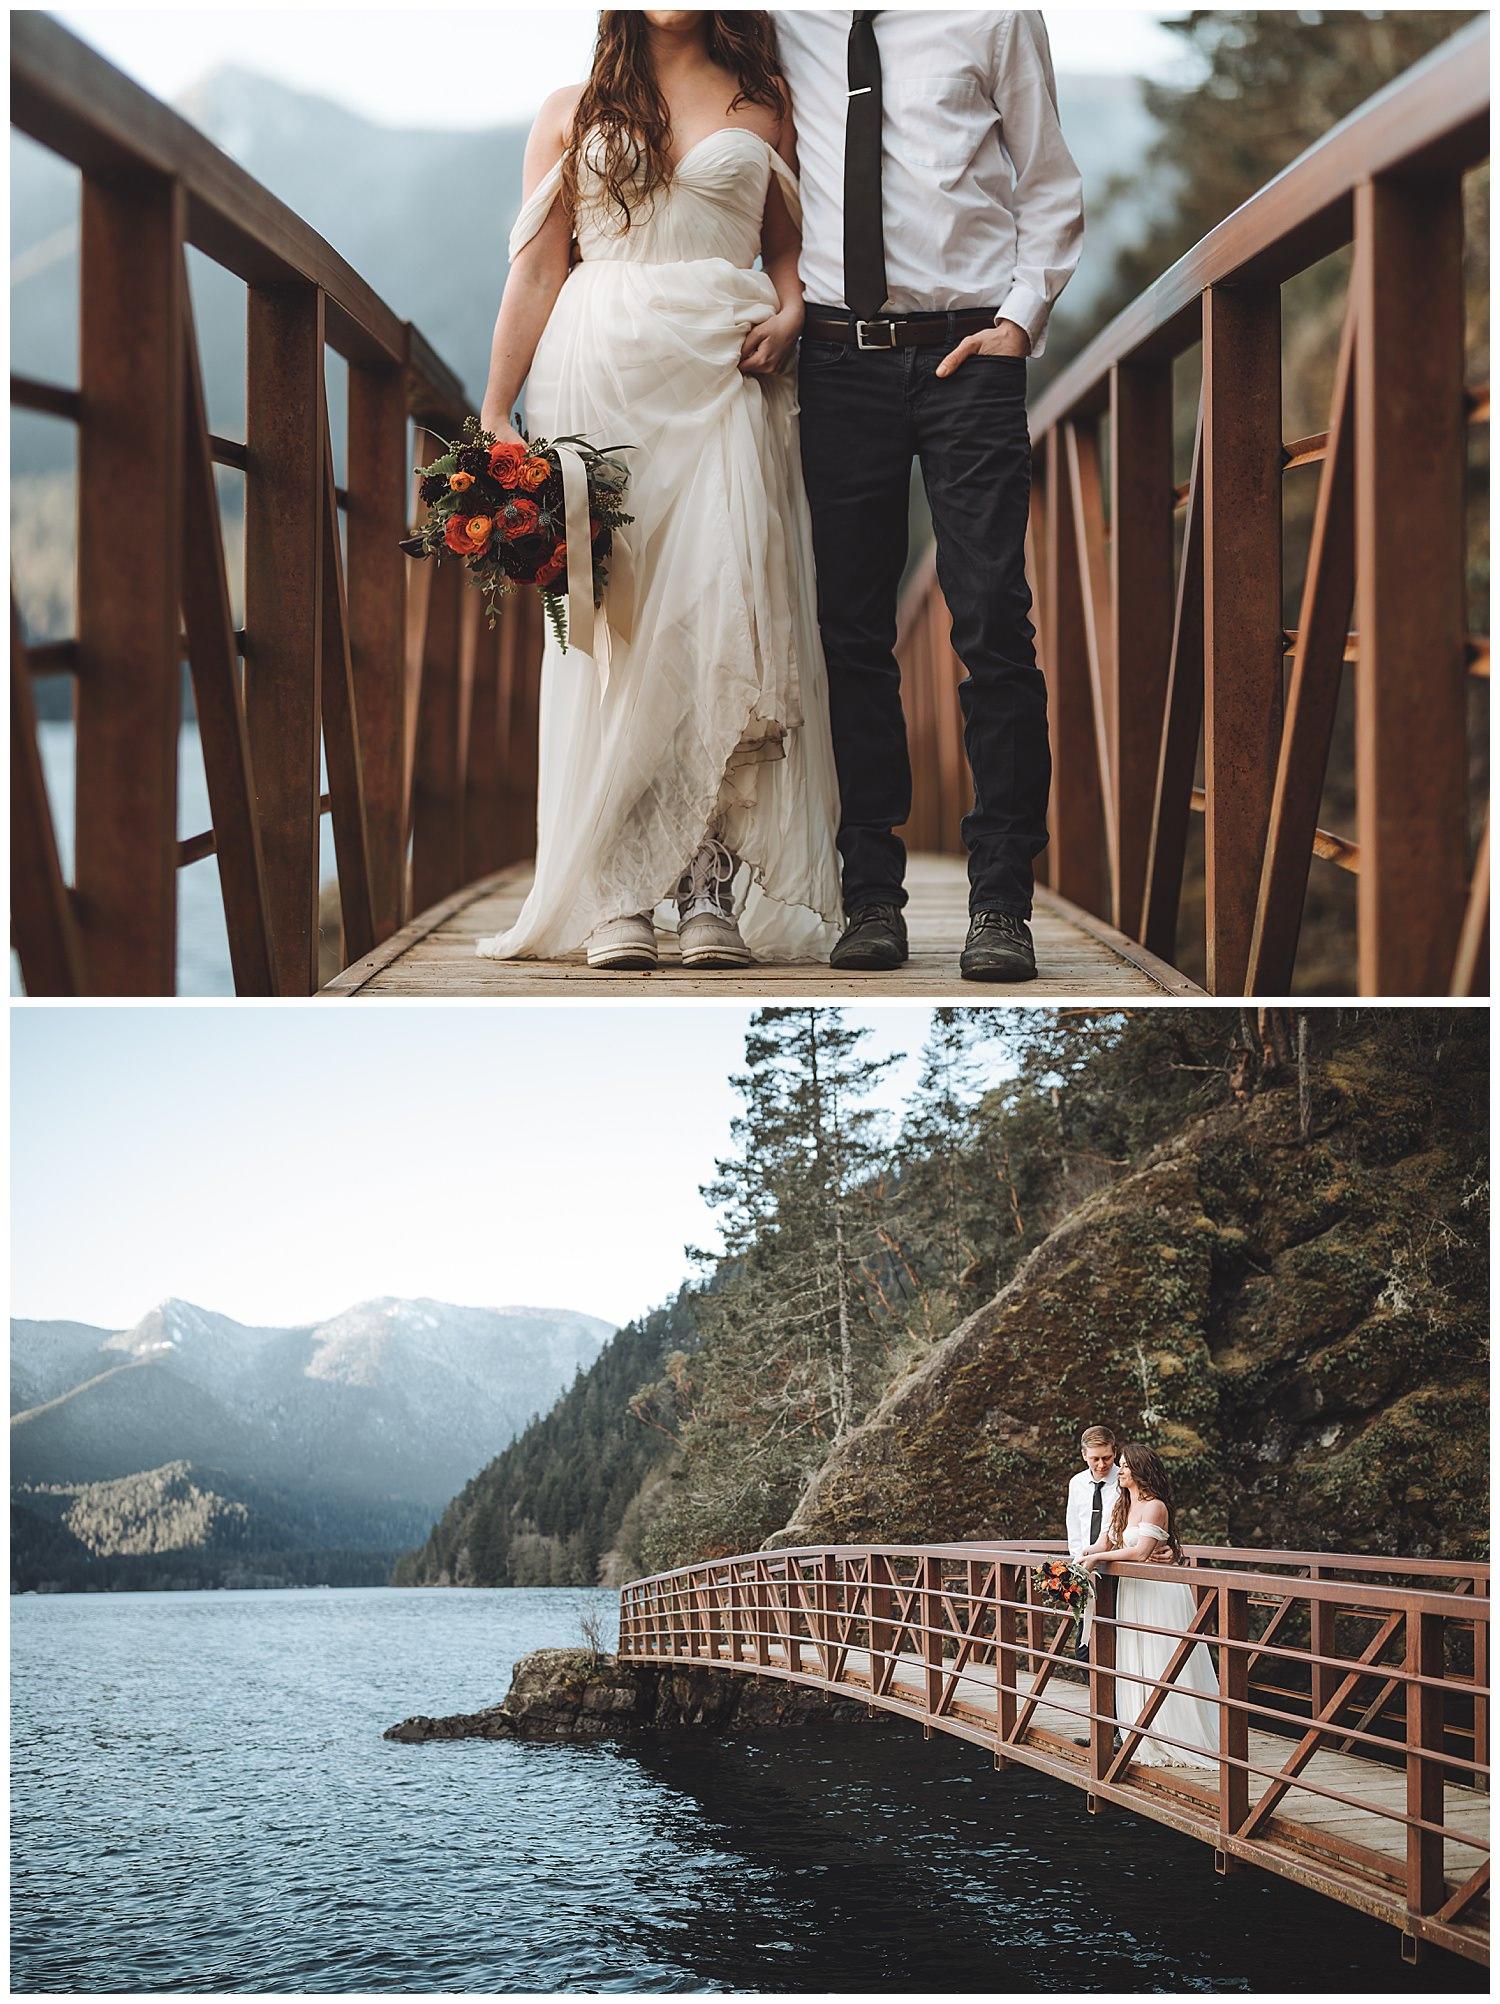 Lake-crescent-elopement_Stephanie-Keegan-Photography_03.jpg